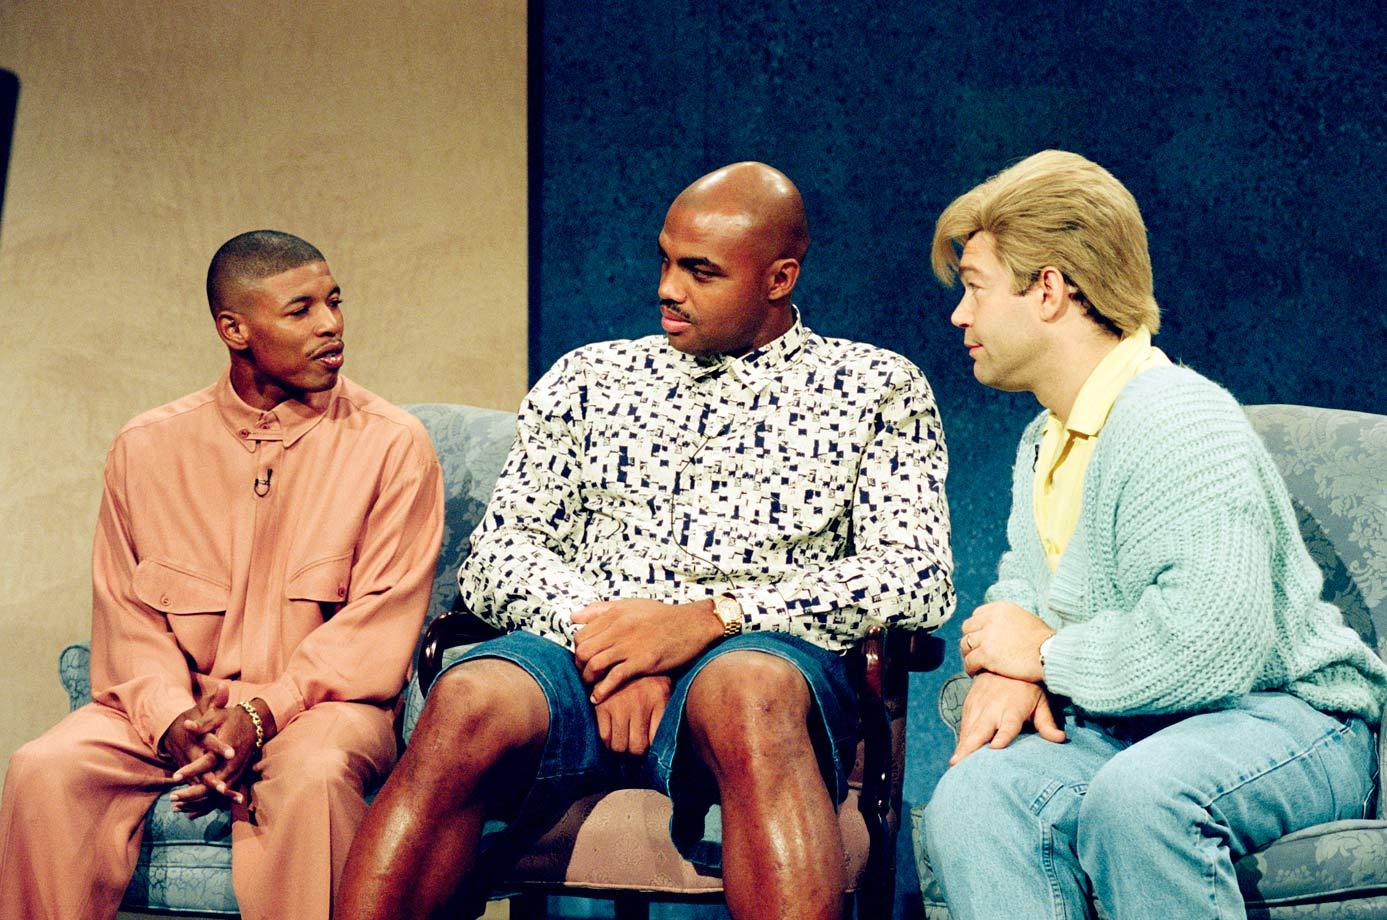 1993 SNL episode